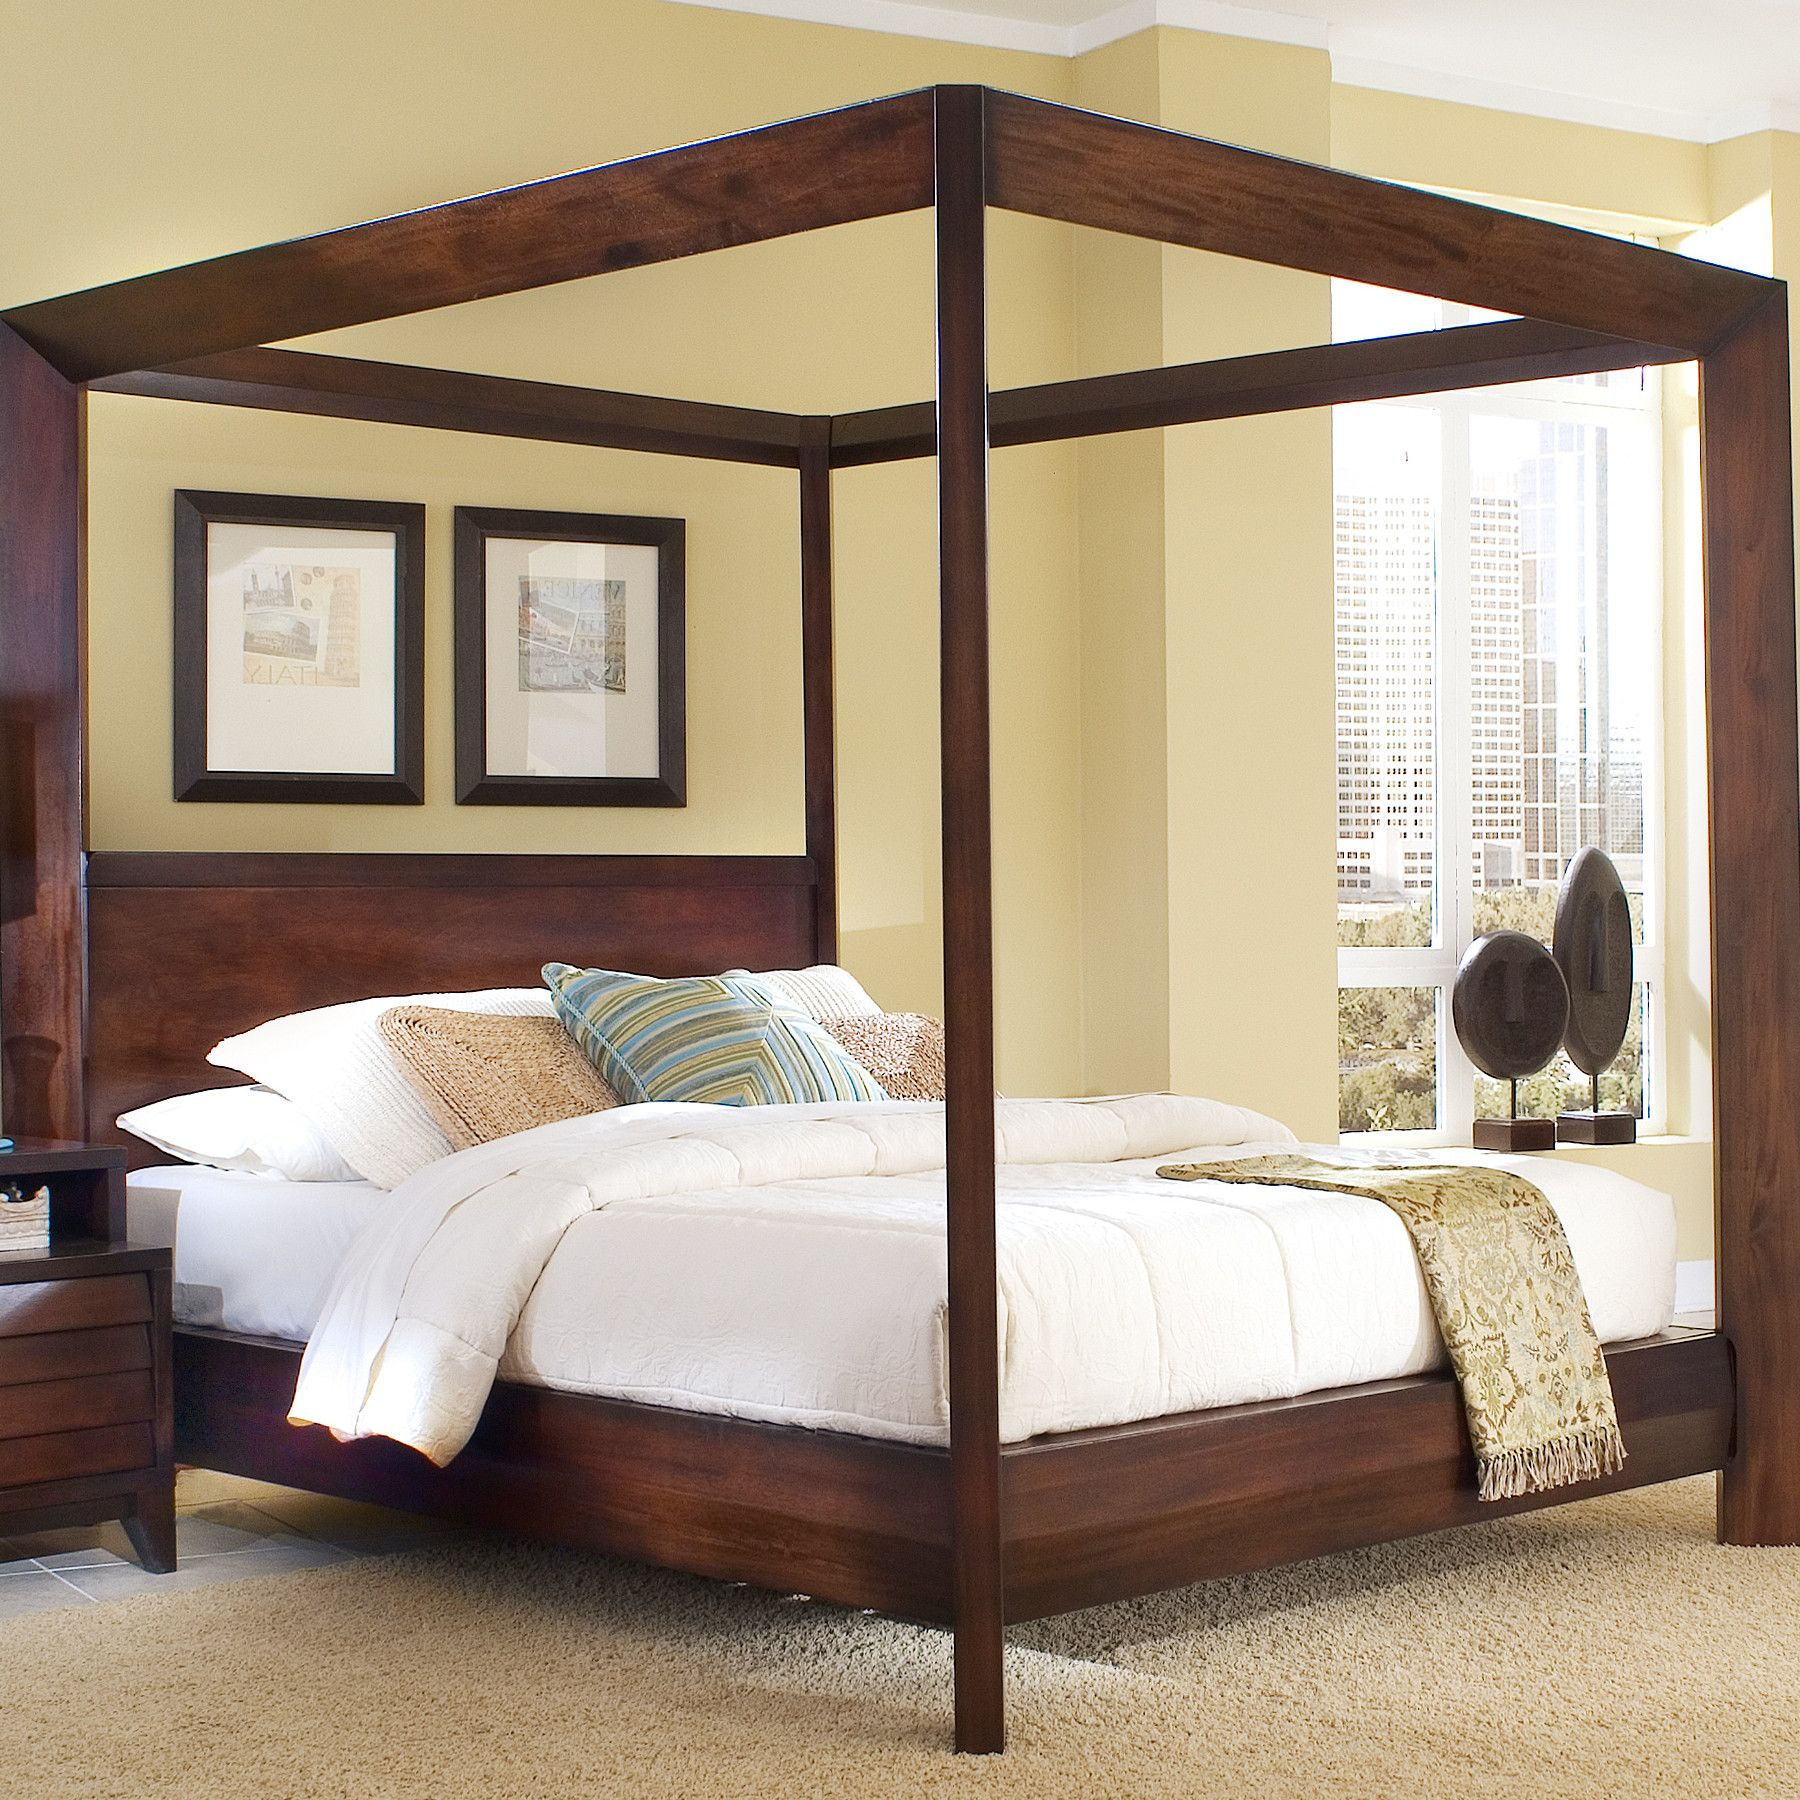 Home Image Island Canopy Bed Reviews Wayfair Wood Canopy Bed Wooden Canopy Bed Canopy Bed Frame